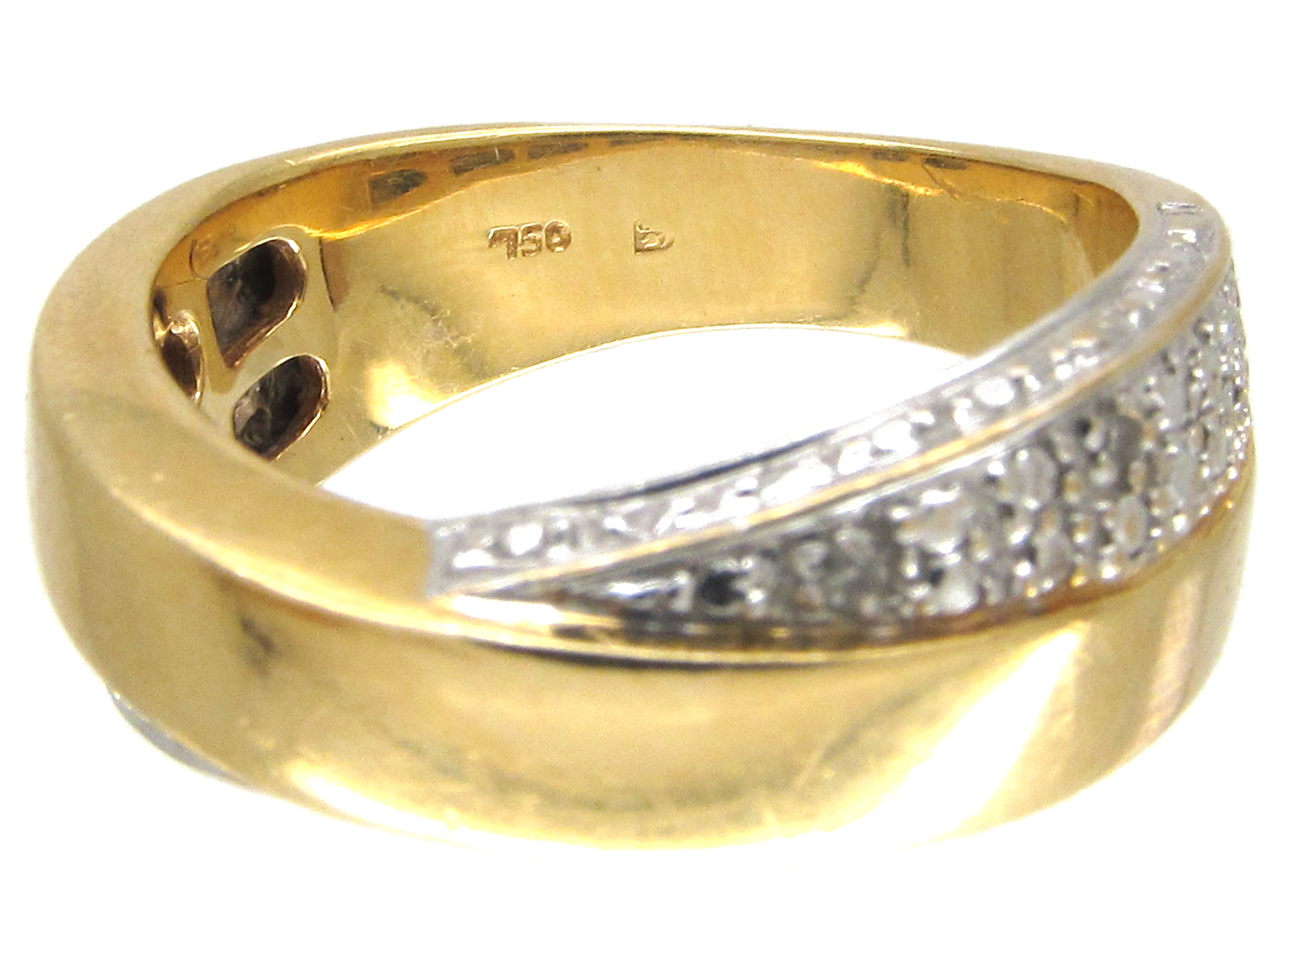 18ct Gold & Diamond Twisted Band Ring by Balmain